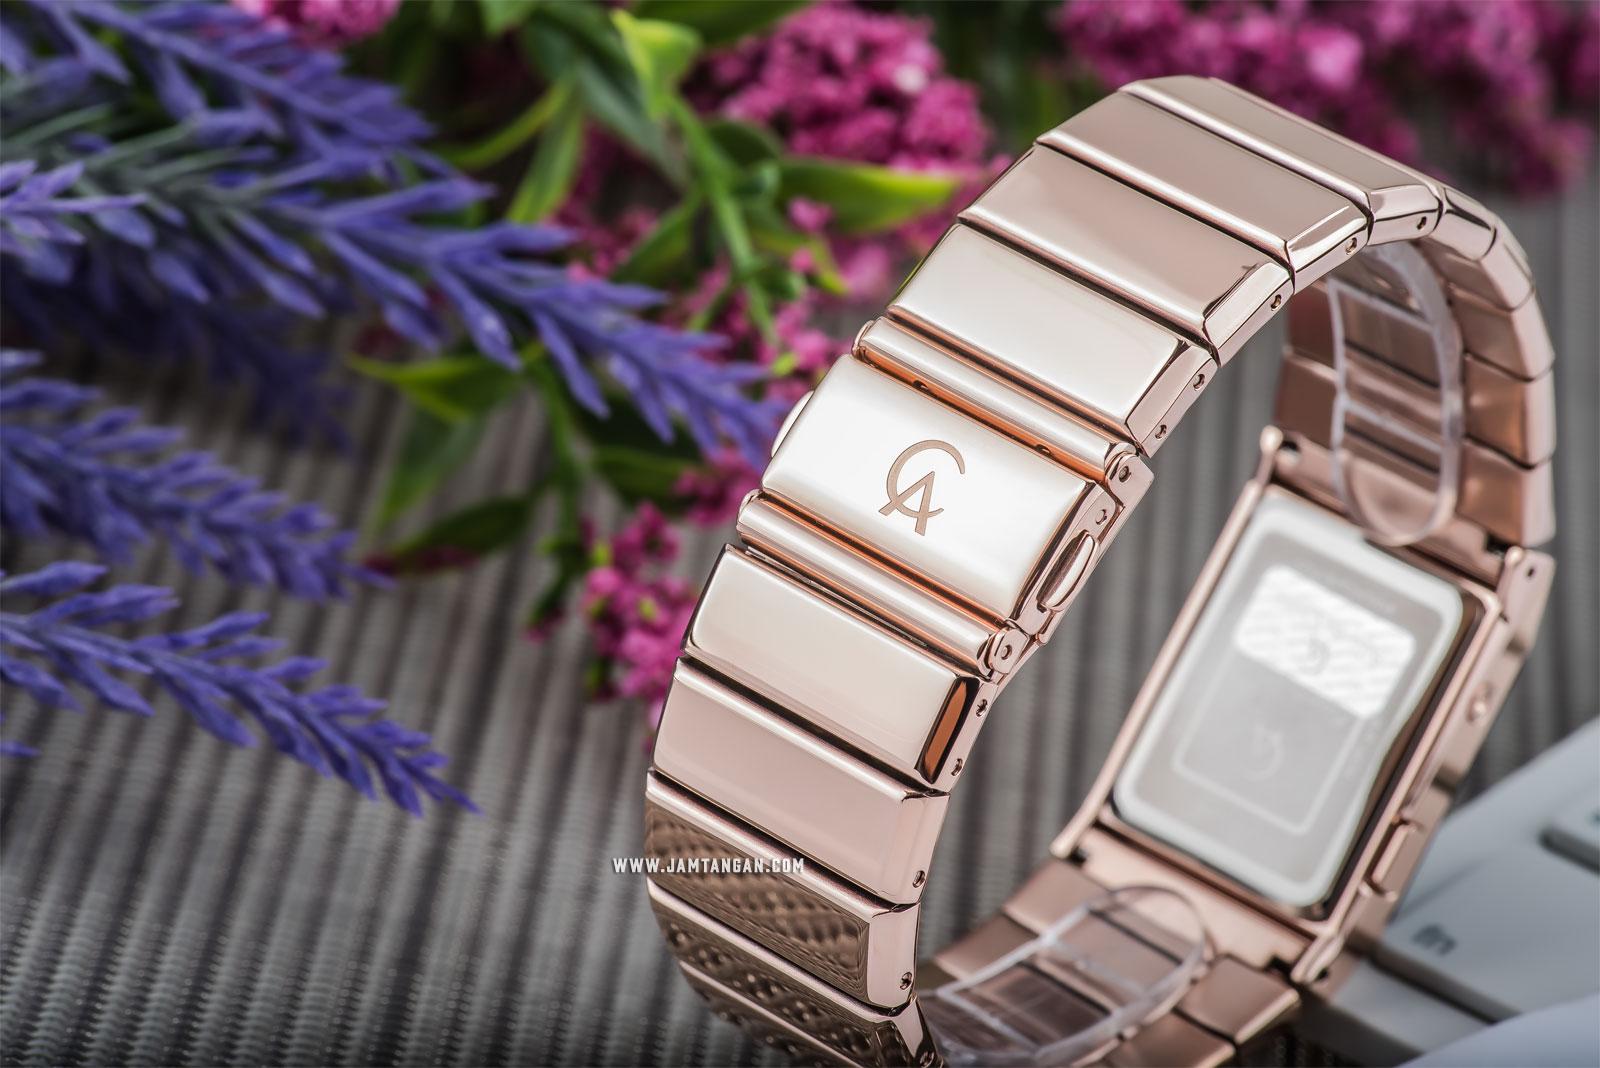 Alexandre Christie AC 9100 LH BRGBA Unisex Digital Dial Rose Gold Stainless Steel Machtwatch